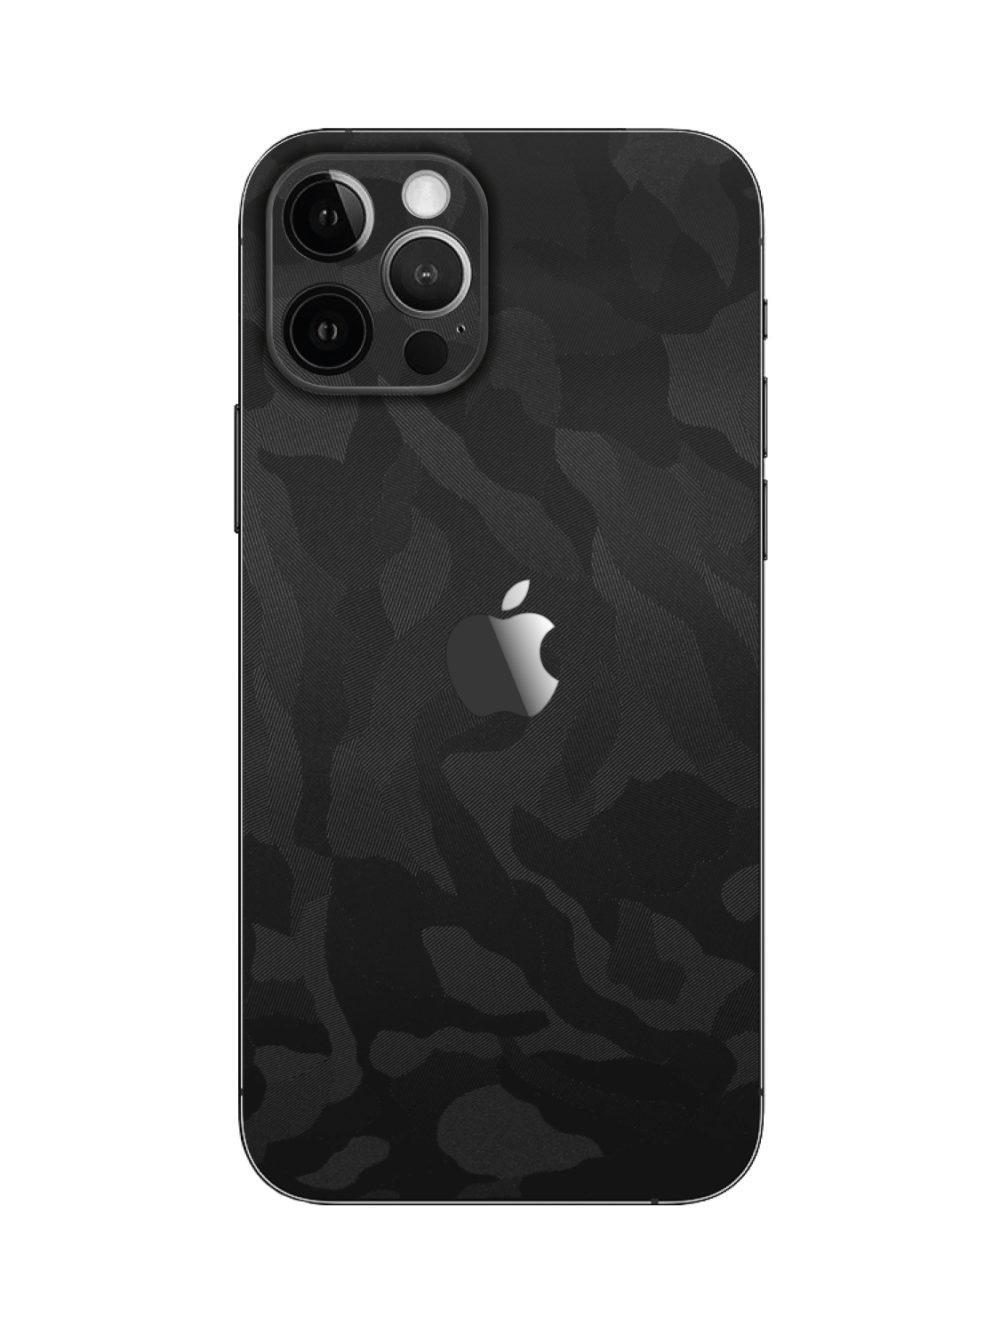 Apple iPhone 12 Pro Max CAMO Vinyl Skin Wrap